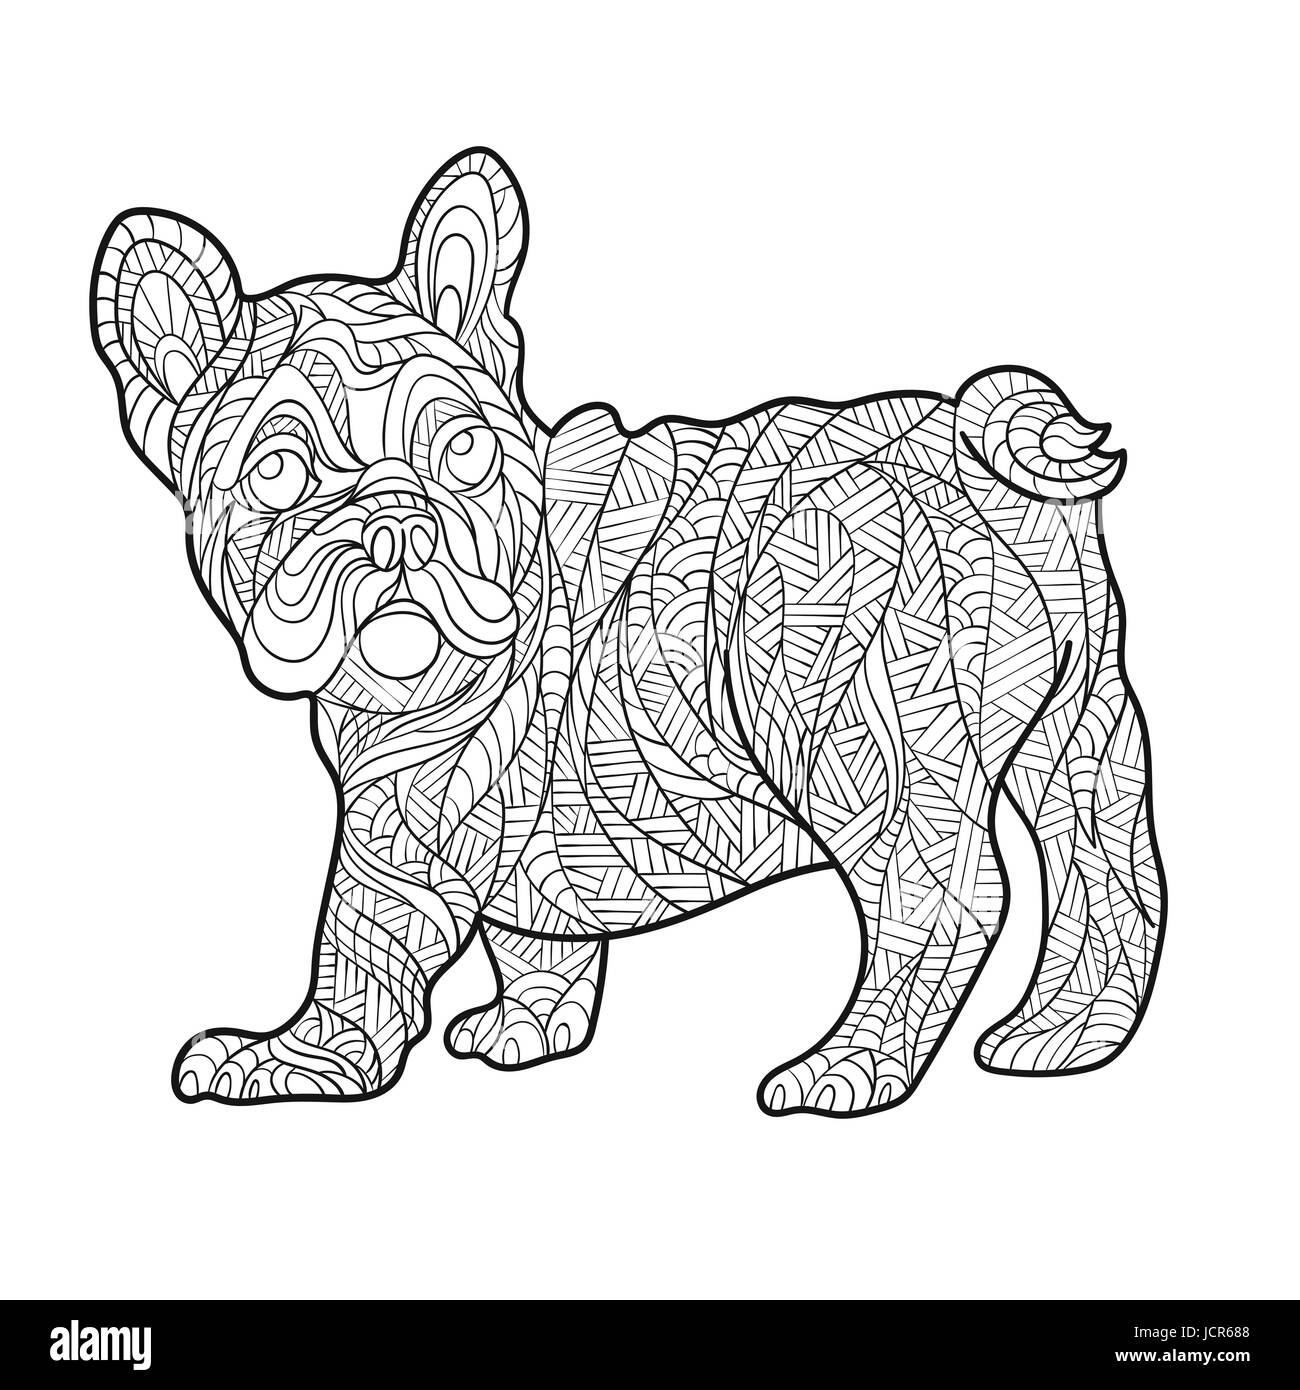 Vector Monochrome Hand Drawn Zentagle Illustration Of French Bulldog Stock Vector Image Art Alamy